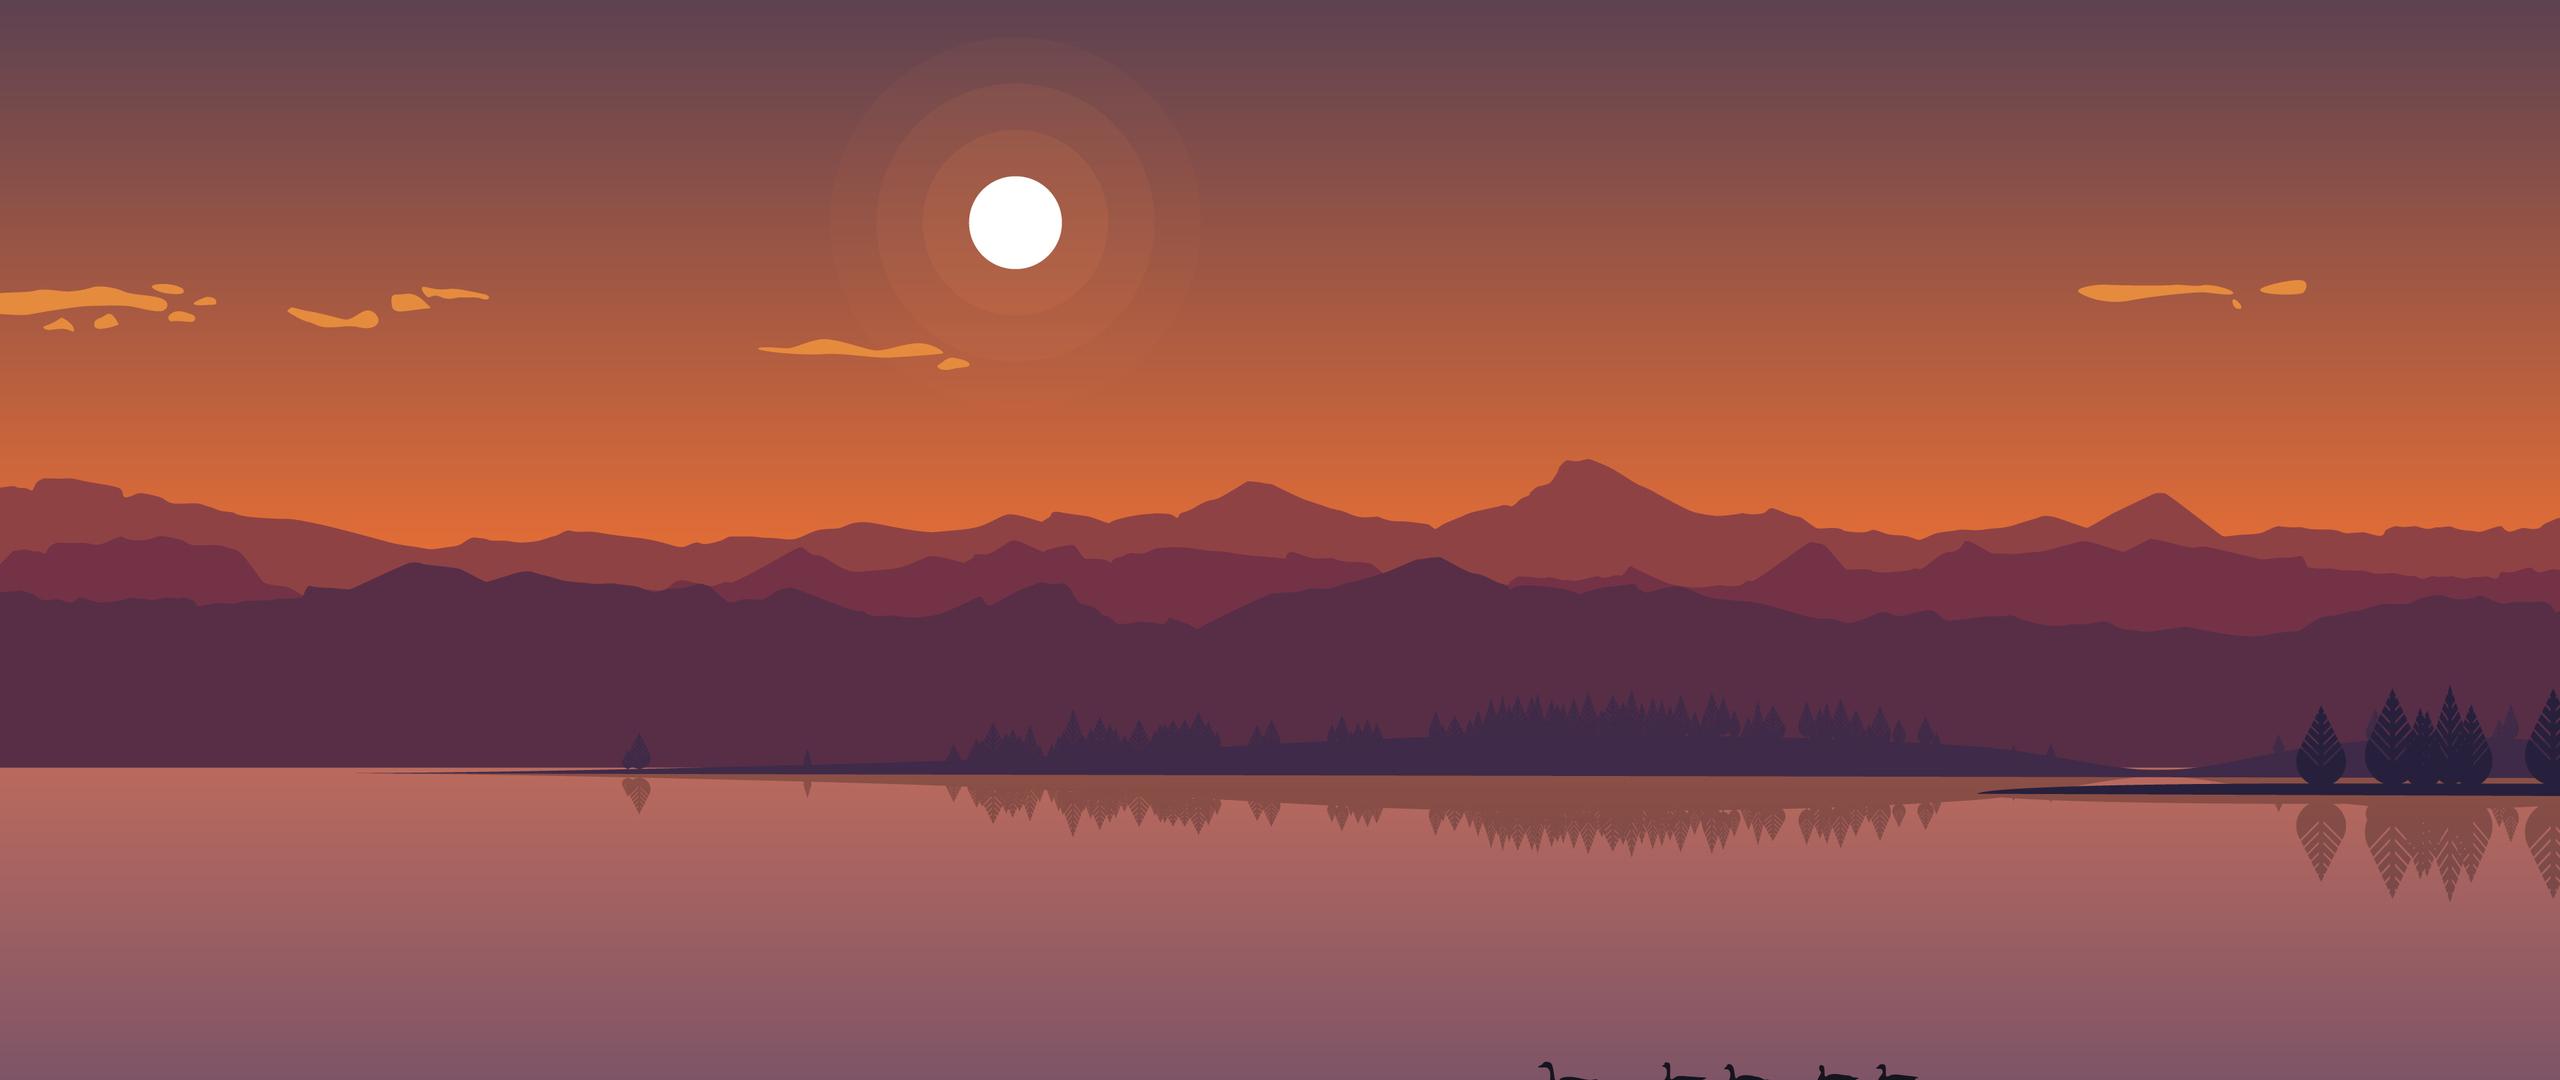 2560x1080 Minimal Lake Sunset 2560x1080 Resolution HD 4k ...